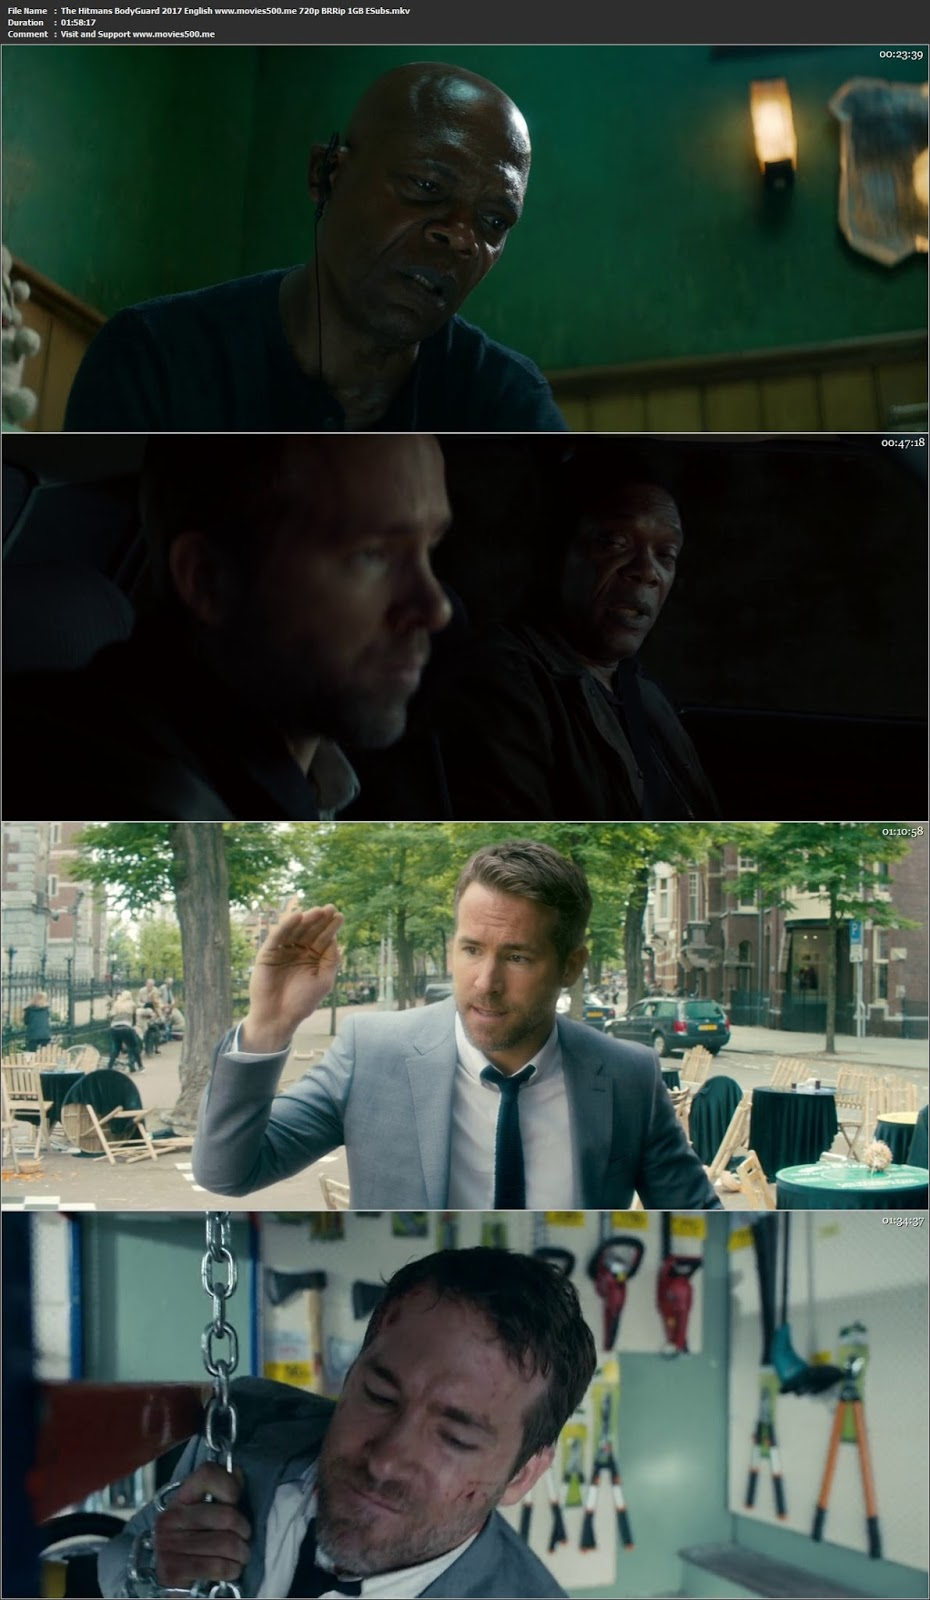 The Hitmans Bodyguard 2017 English Full Movie BRRip 720p ESUbs at movies500.xyz